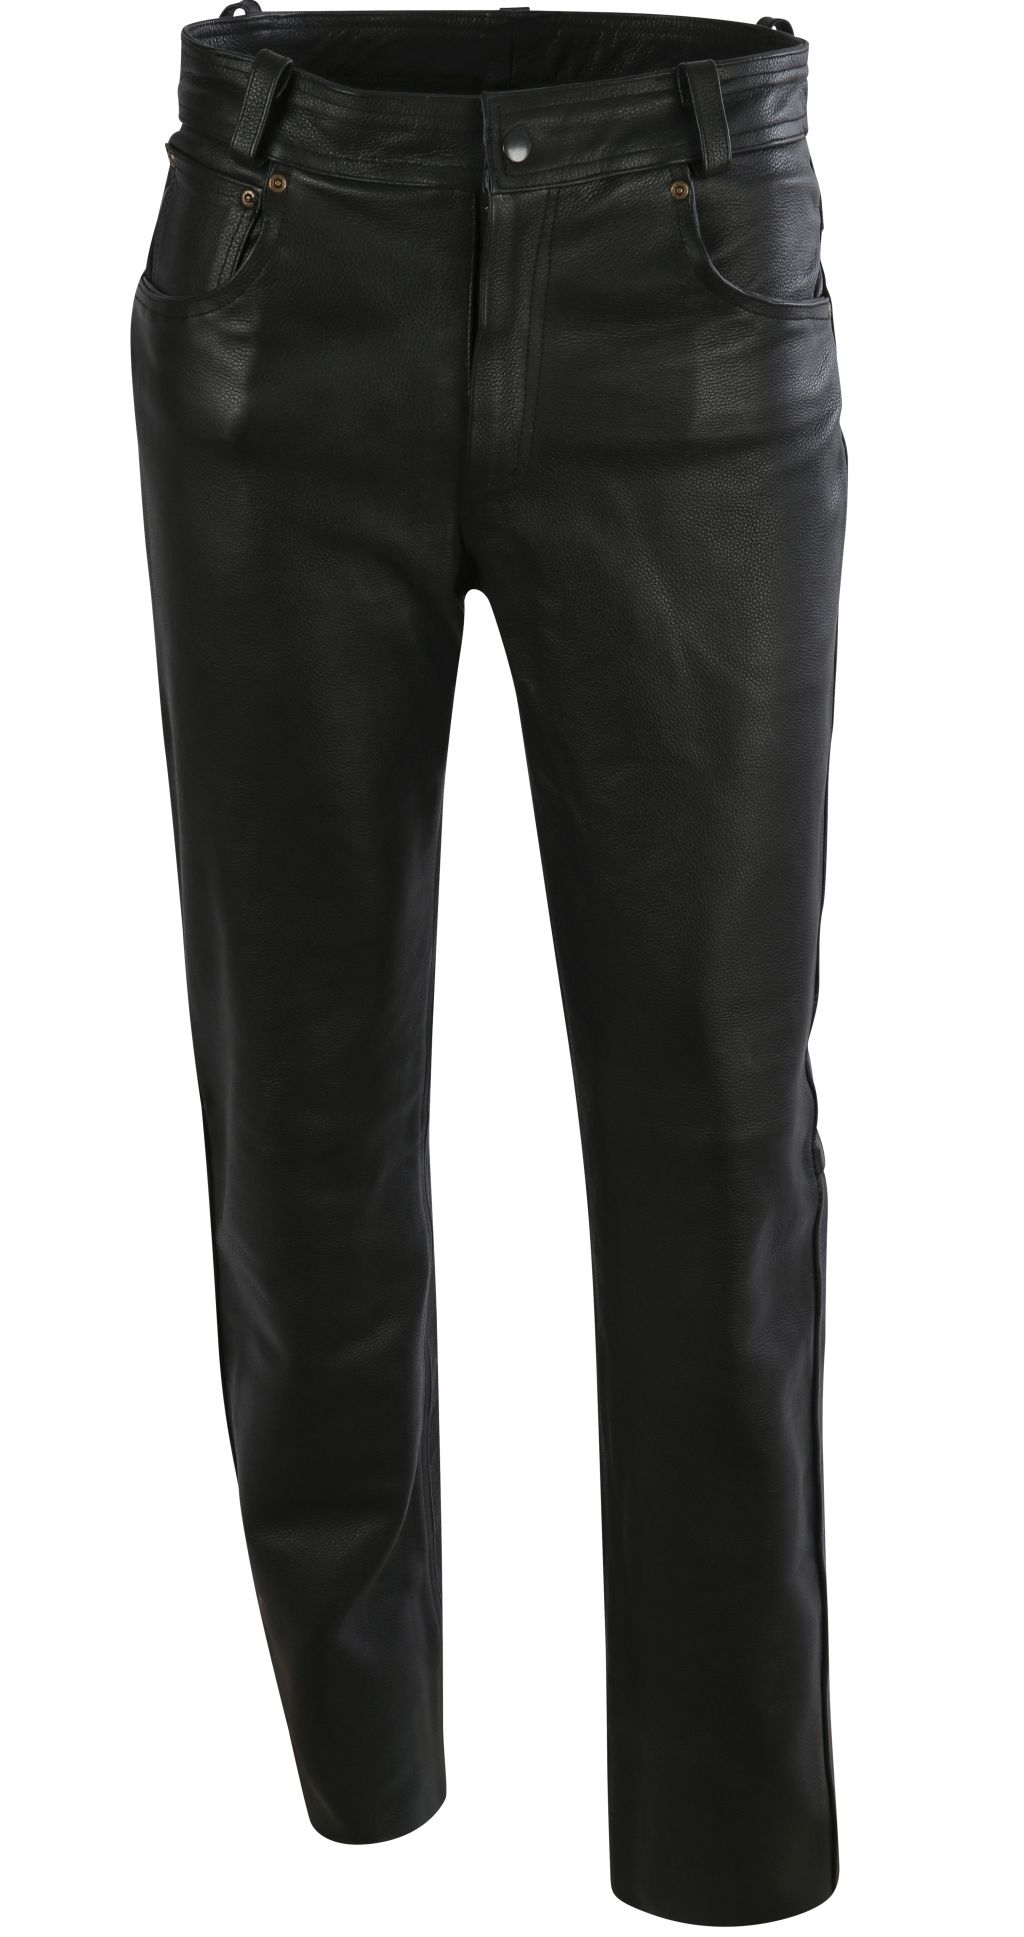 Bangla Herren Lederhose Elegante Lederjeans Biker Jeans Schwarz 36- 46 inch